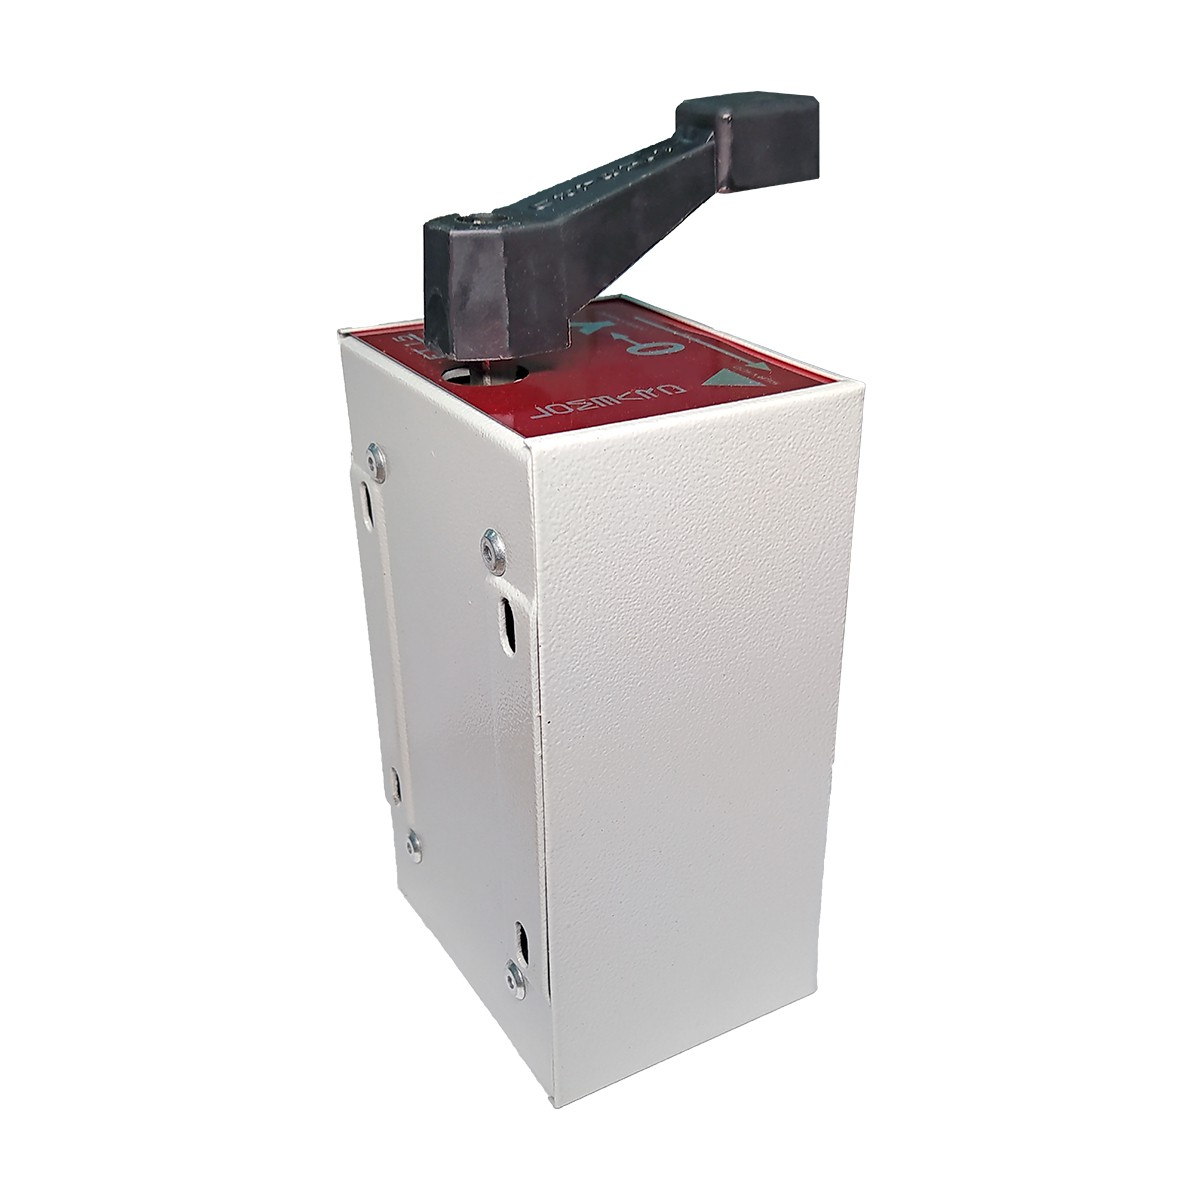 Motor Elétrico Blindado 10cv 4polos Mono Baixa Rotação  Chave Paralela